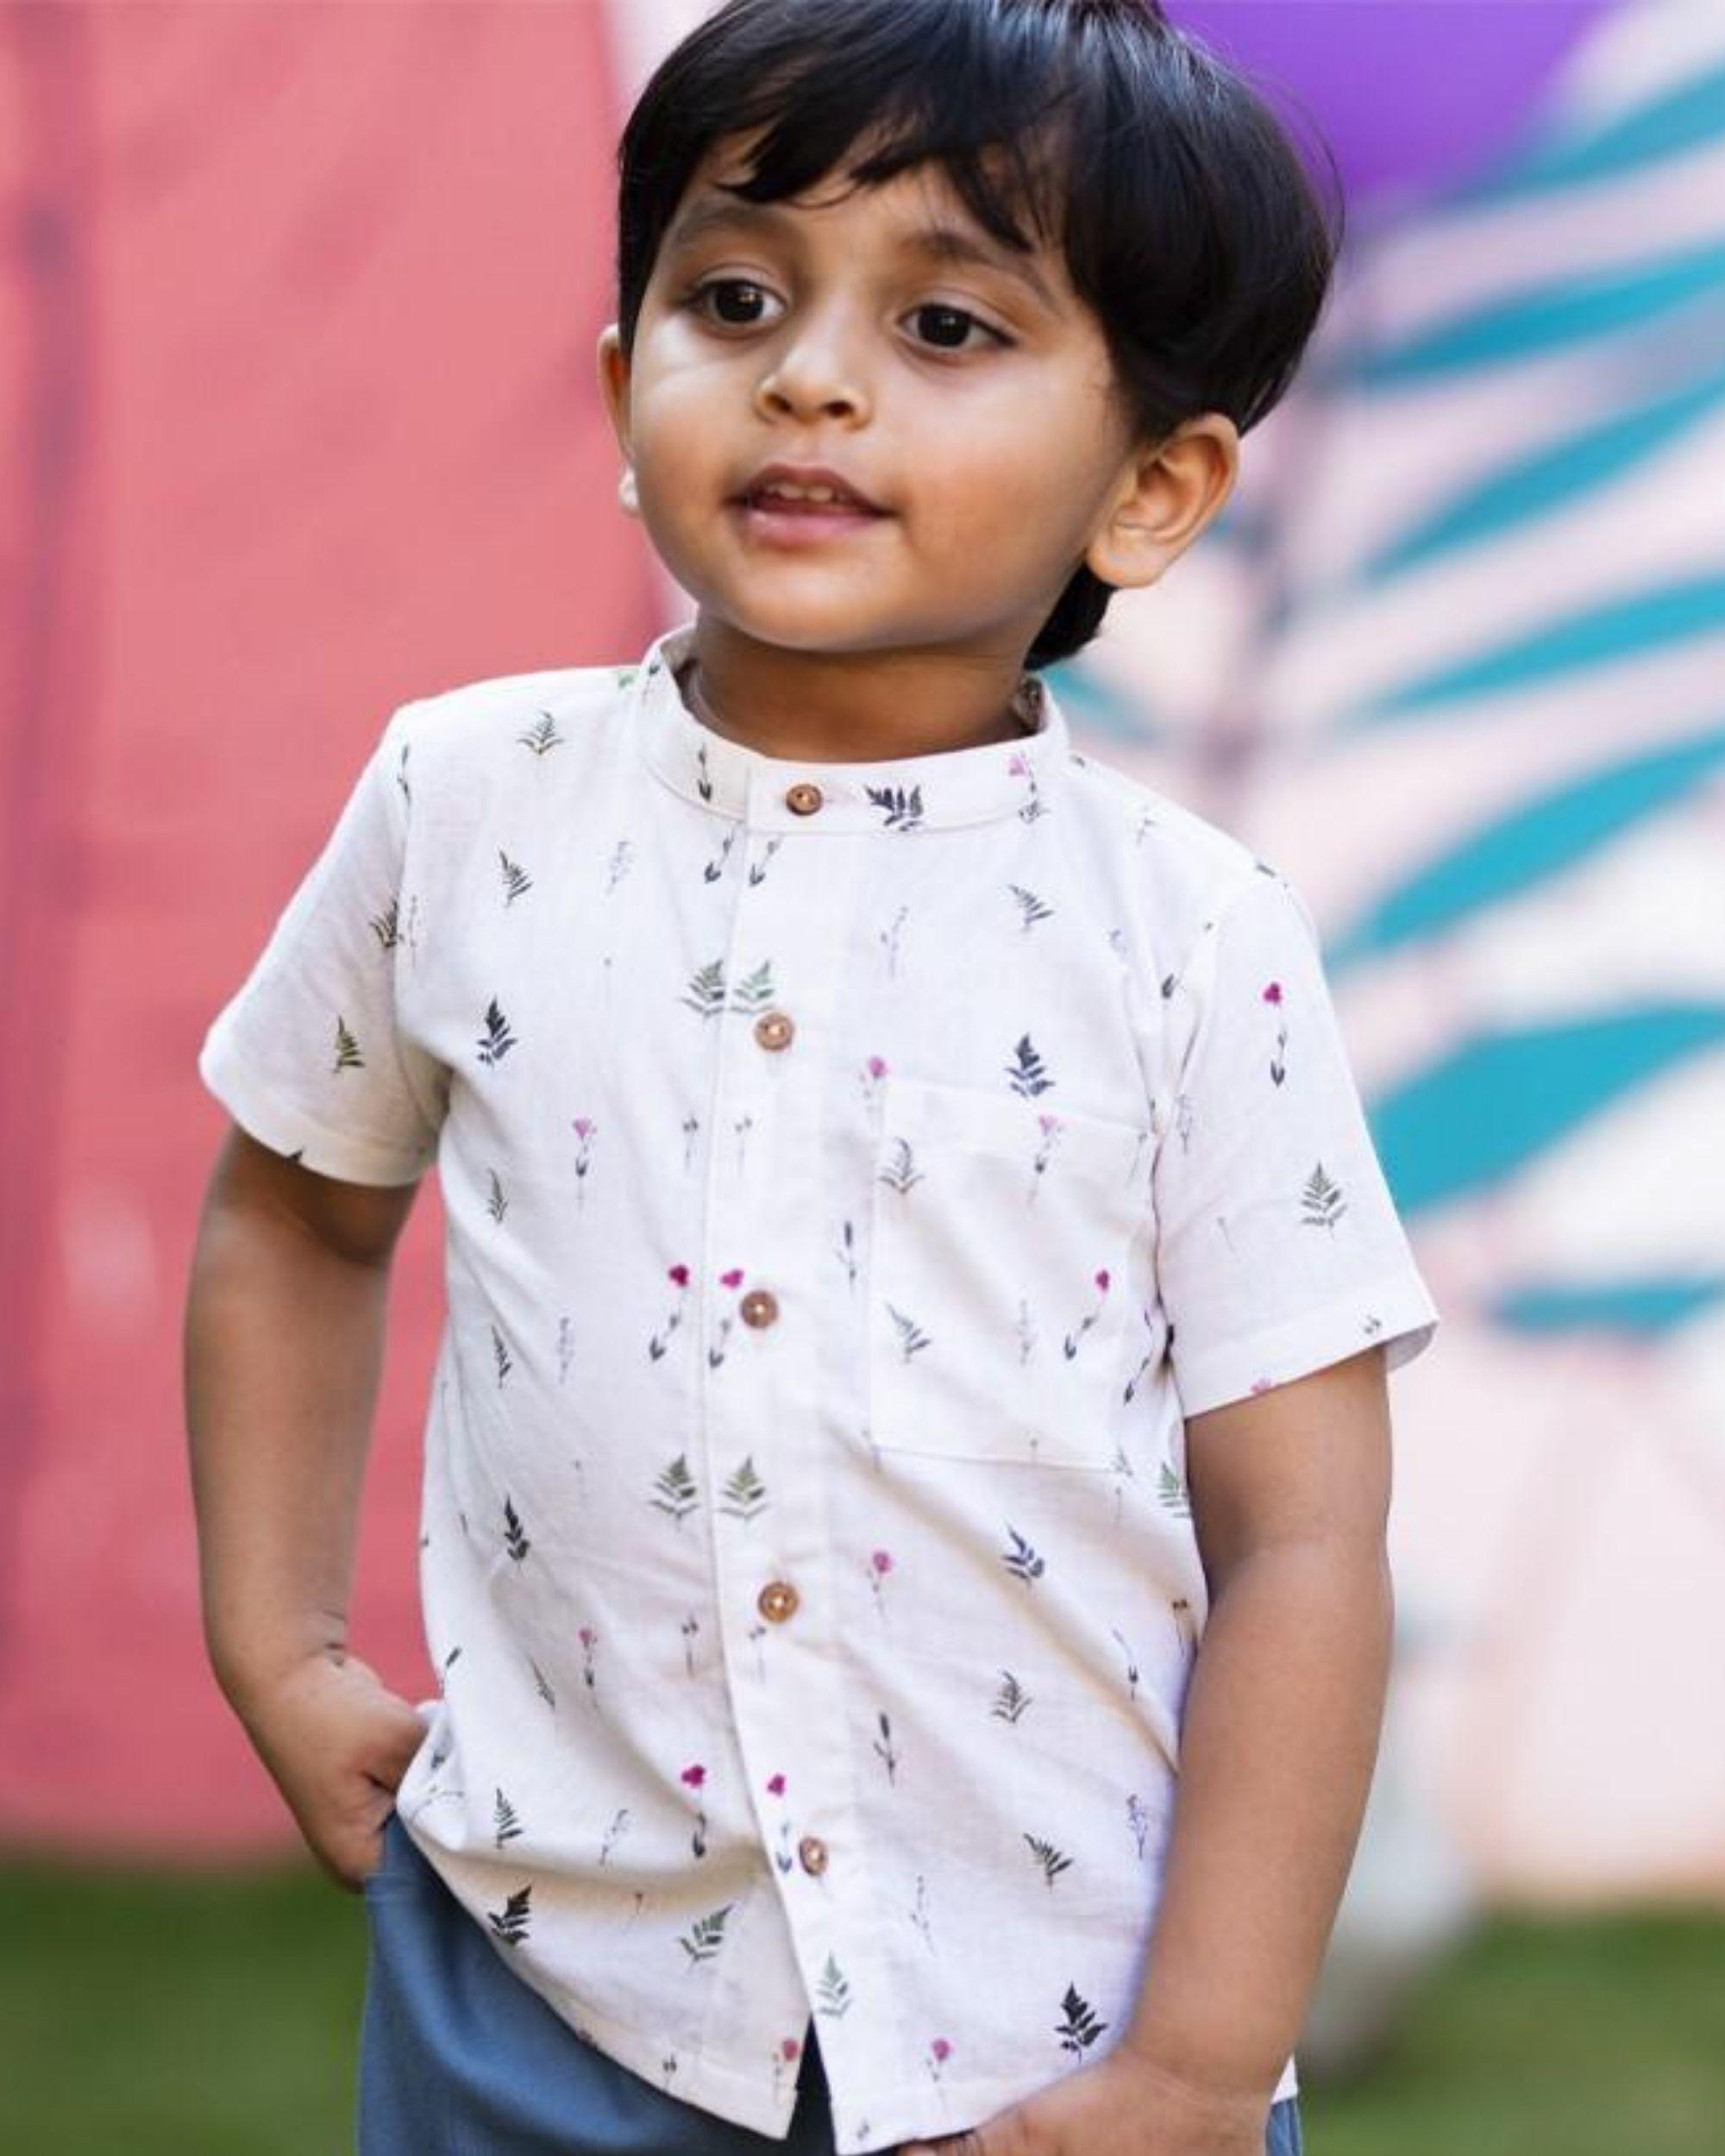 Beige ferns and rose printed shirt